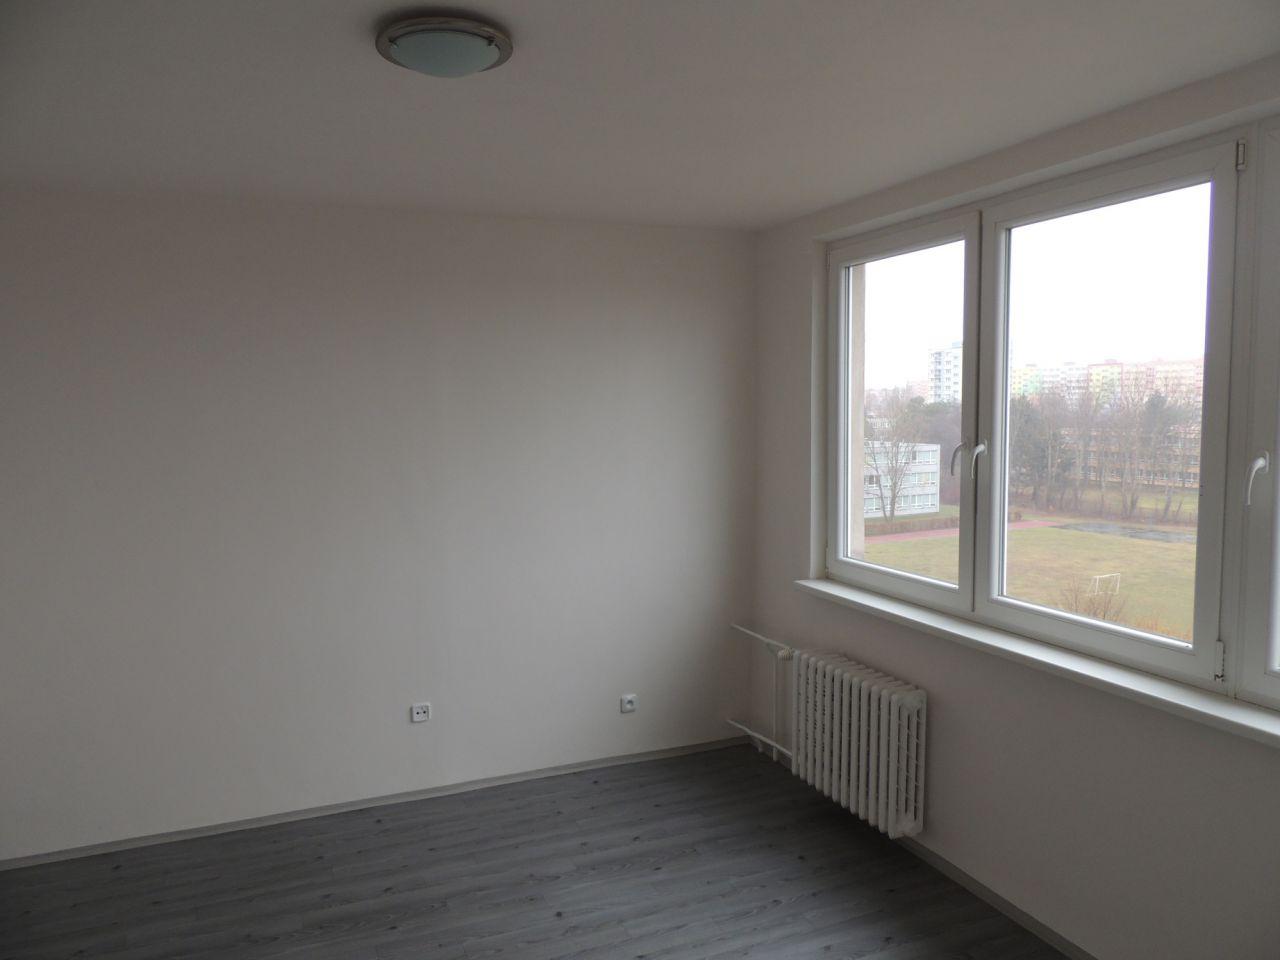 Pronájem bytu 2+1 44 m2, ul. Jana Maluchy 63, Ostrava - Dubina